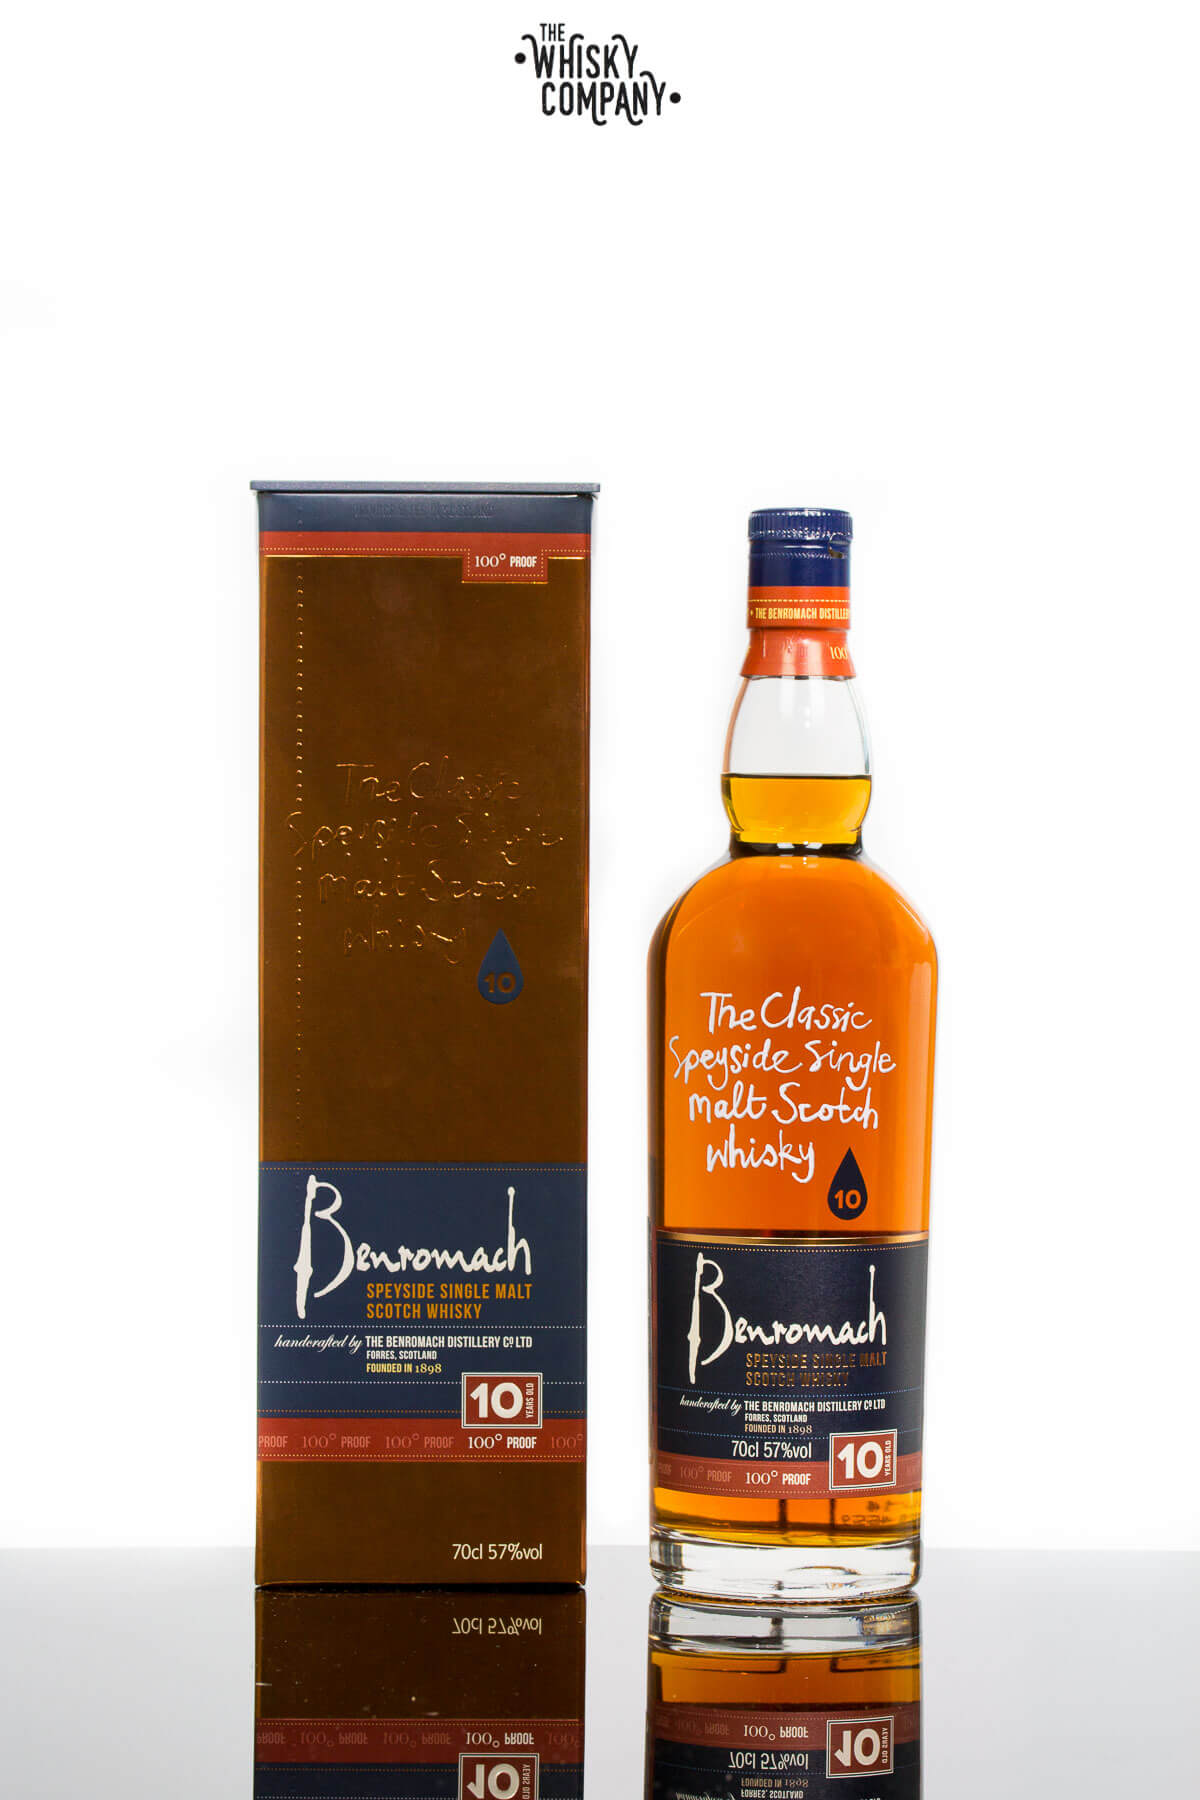 Benromach 10 Years Old 100 Proof Speyside Single Malt Scotch Whisky (700ml)